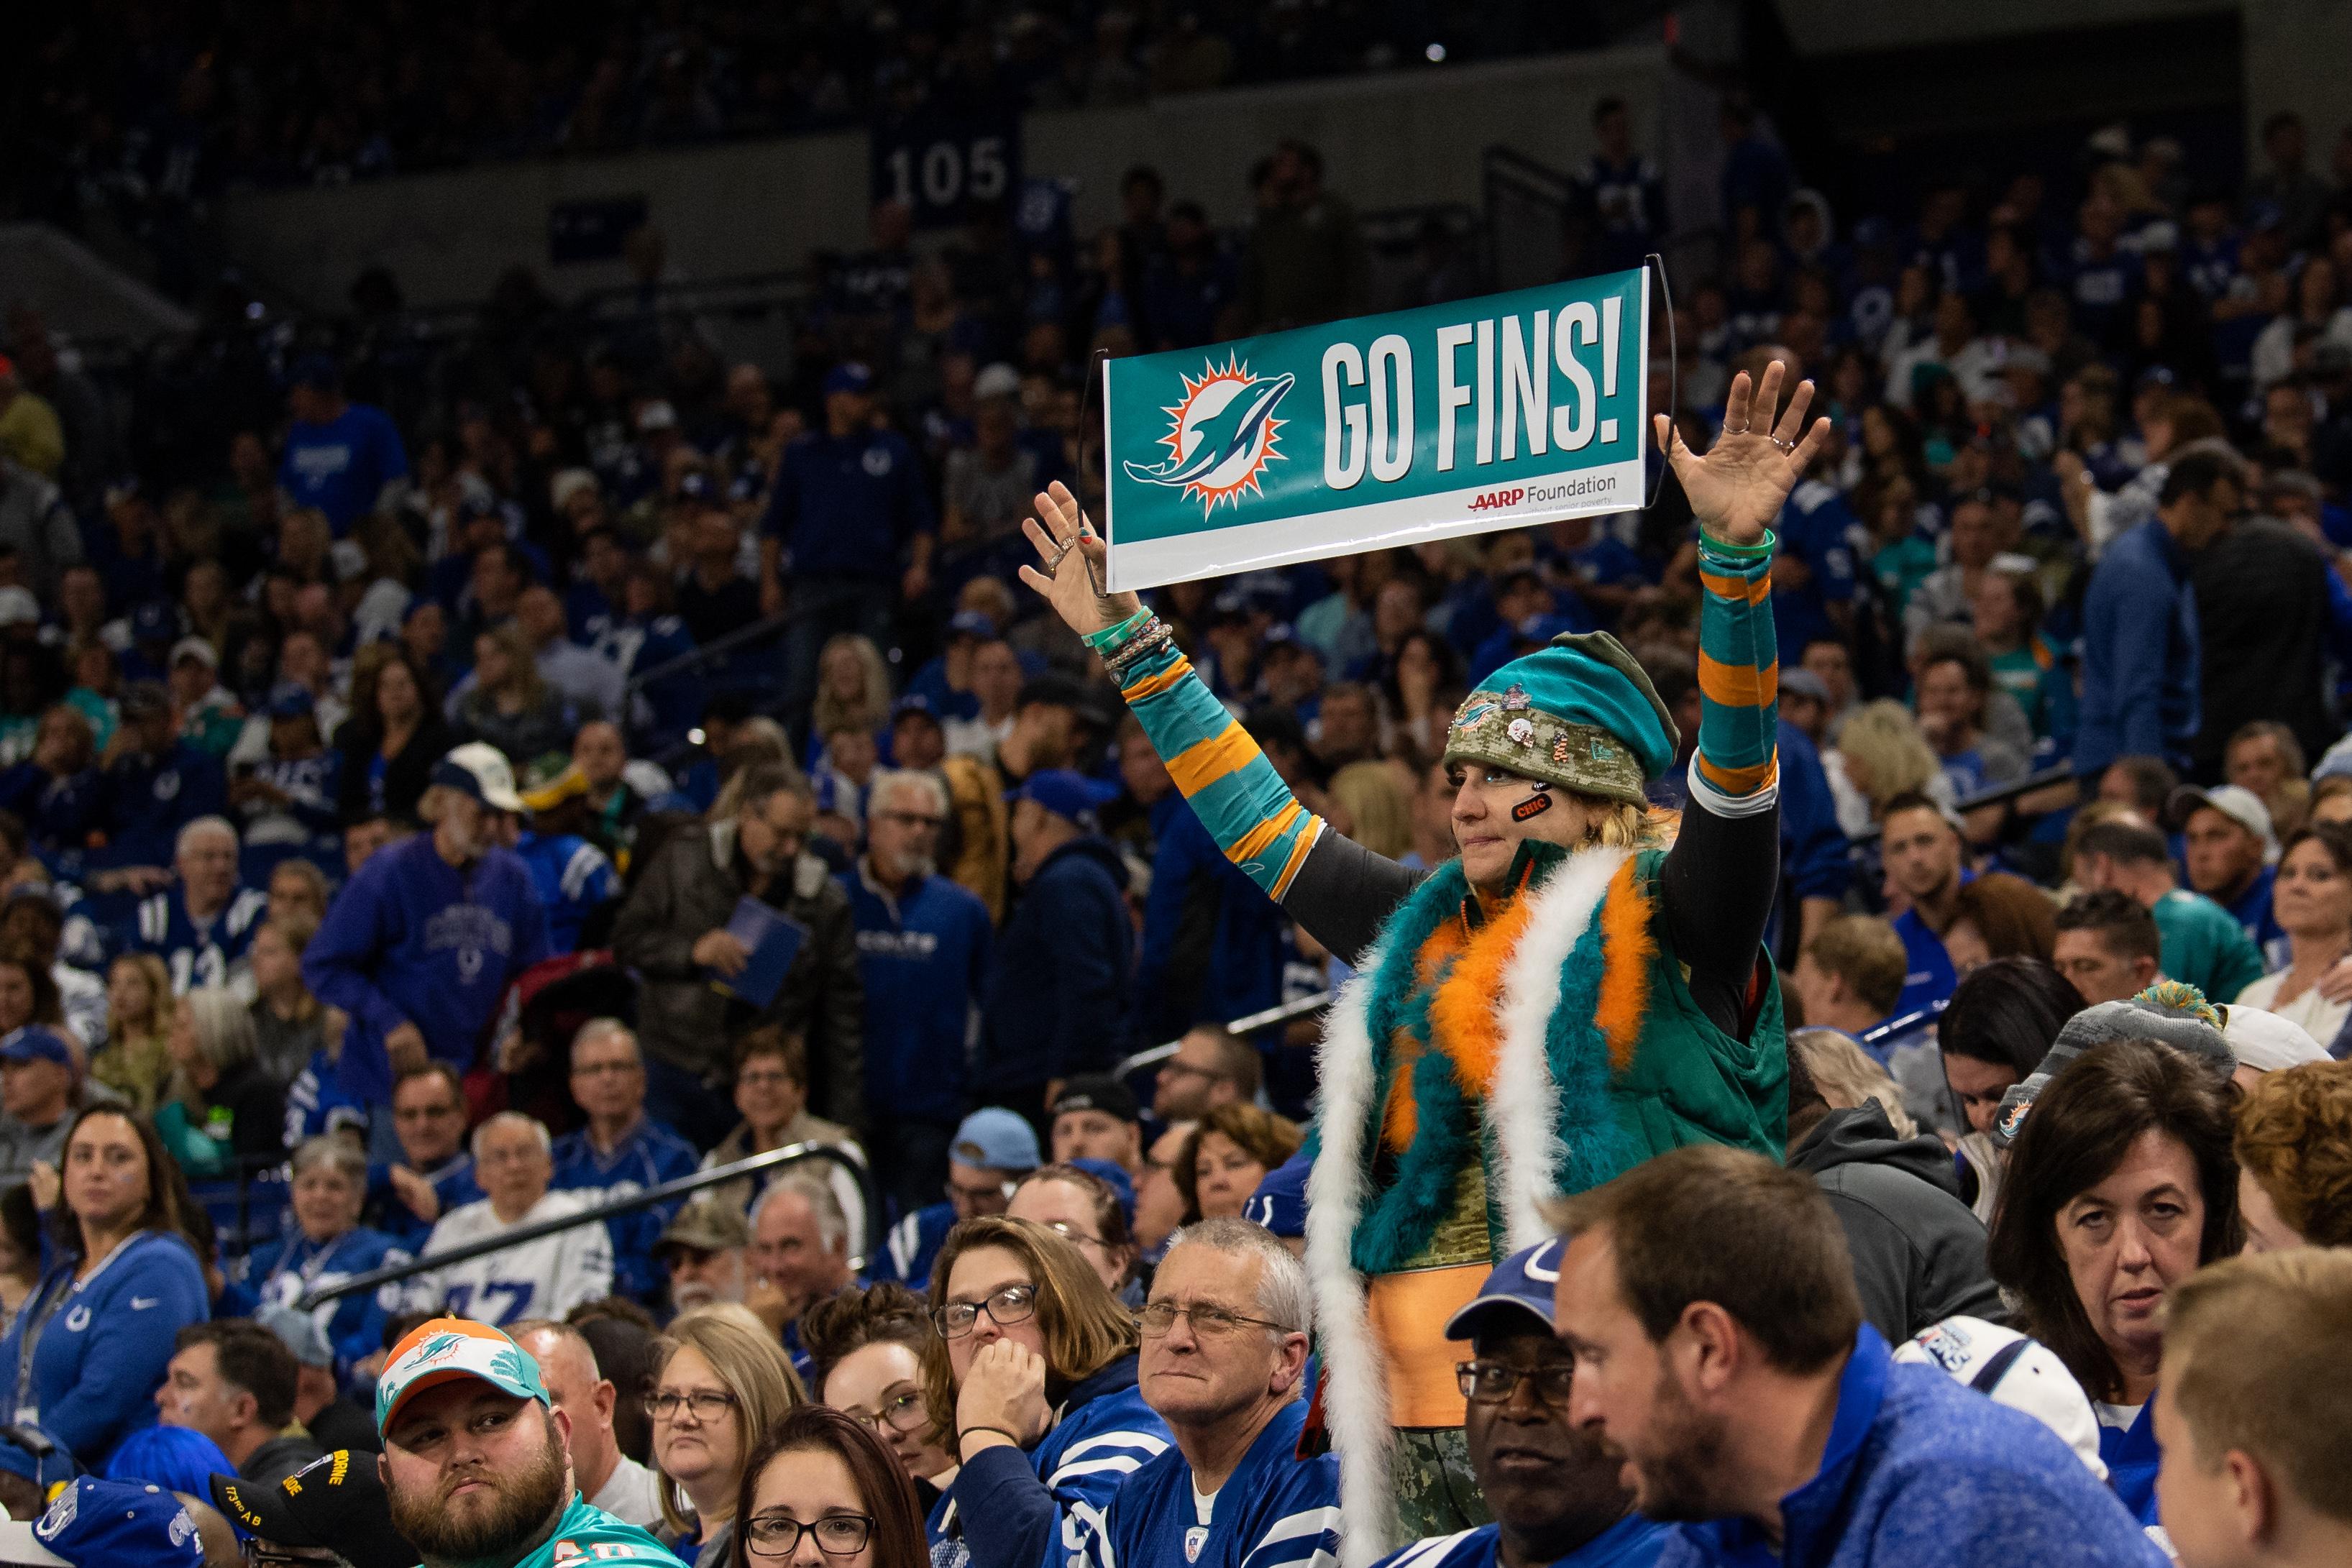 NFL: NOV 10 Dolphins at Colts